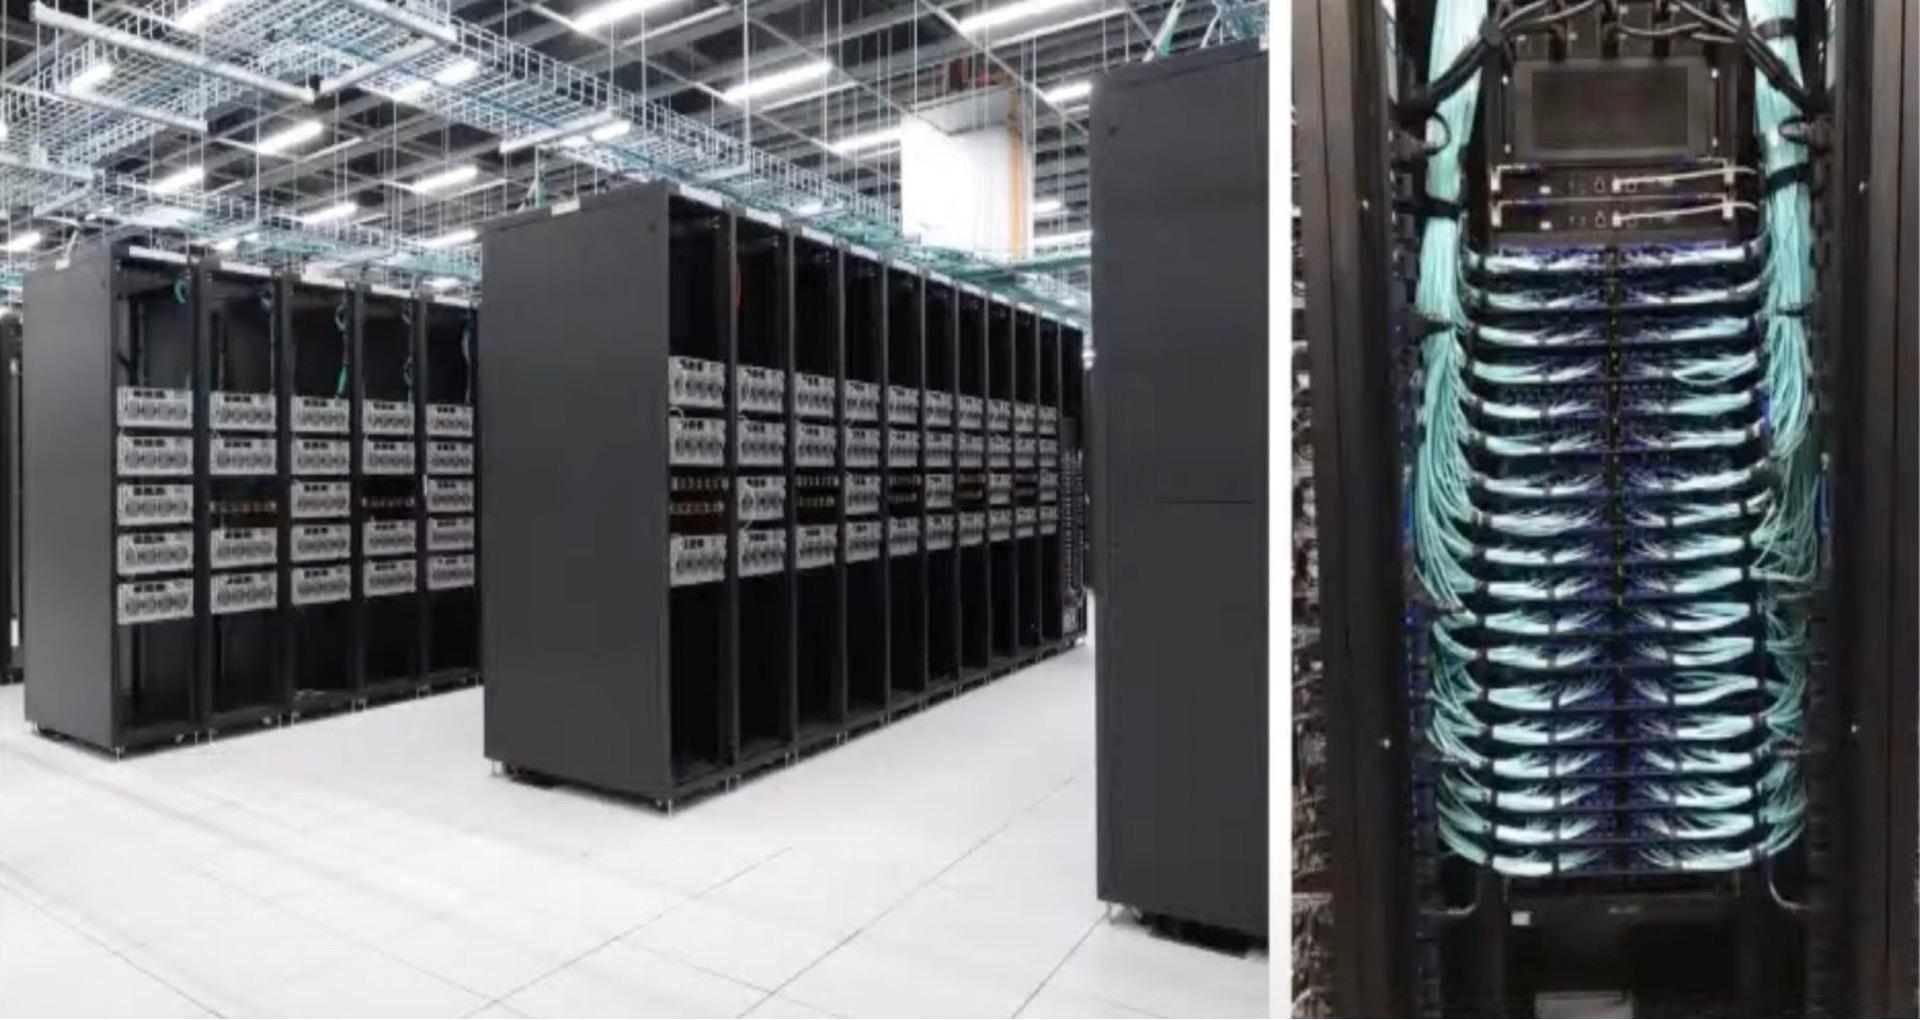 Tesla Unveils Supercomputer Powered by NVIDIA GPUs   NVIDIA Blog